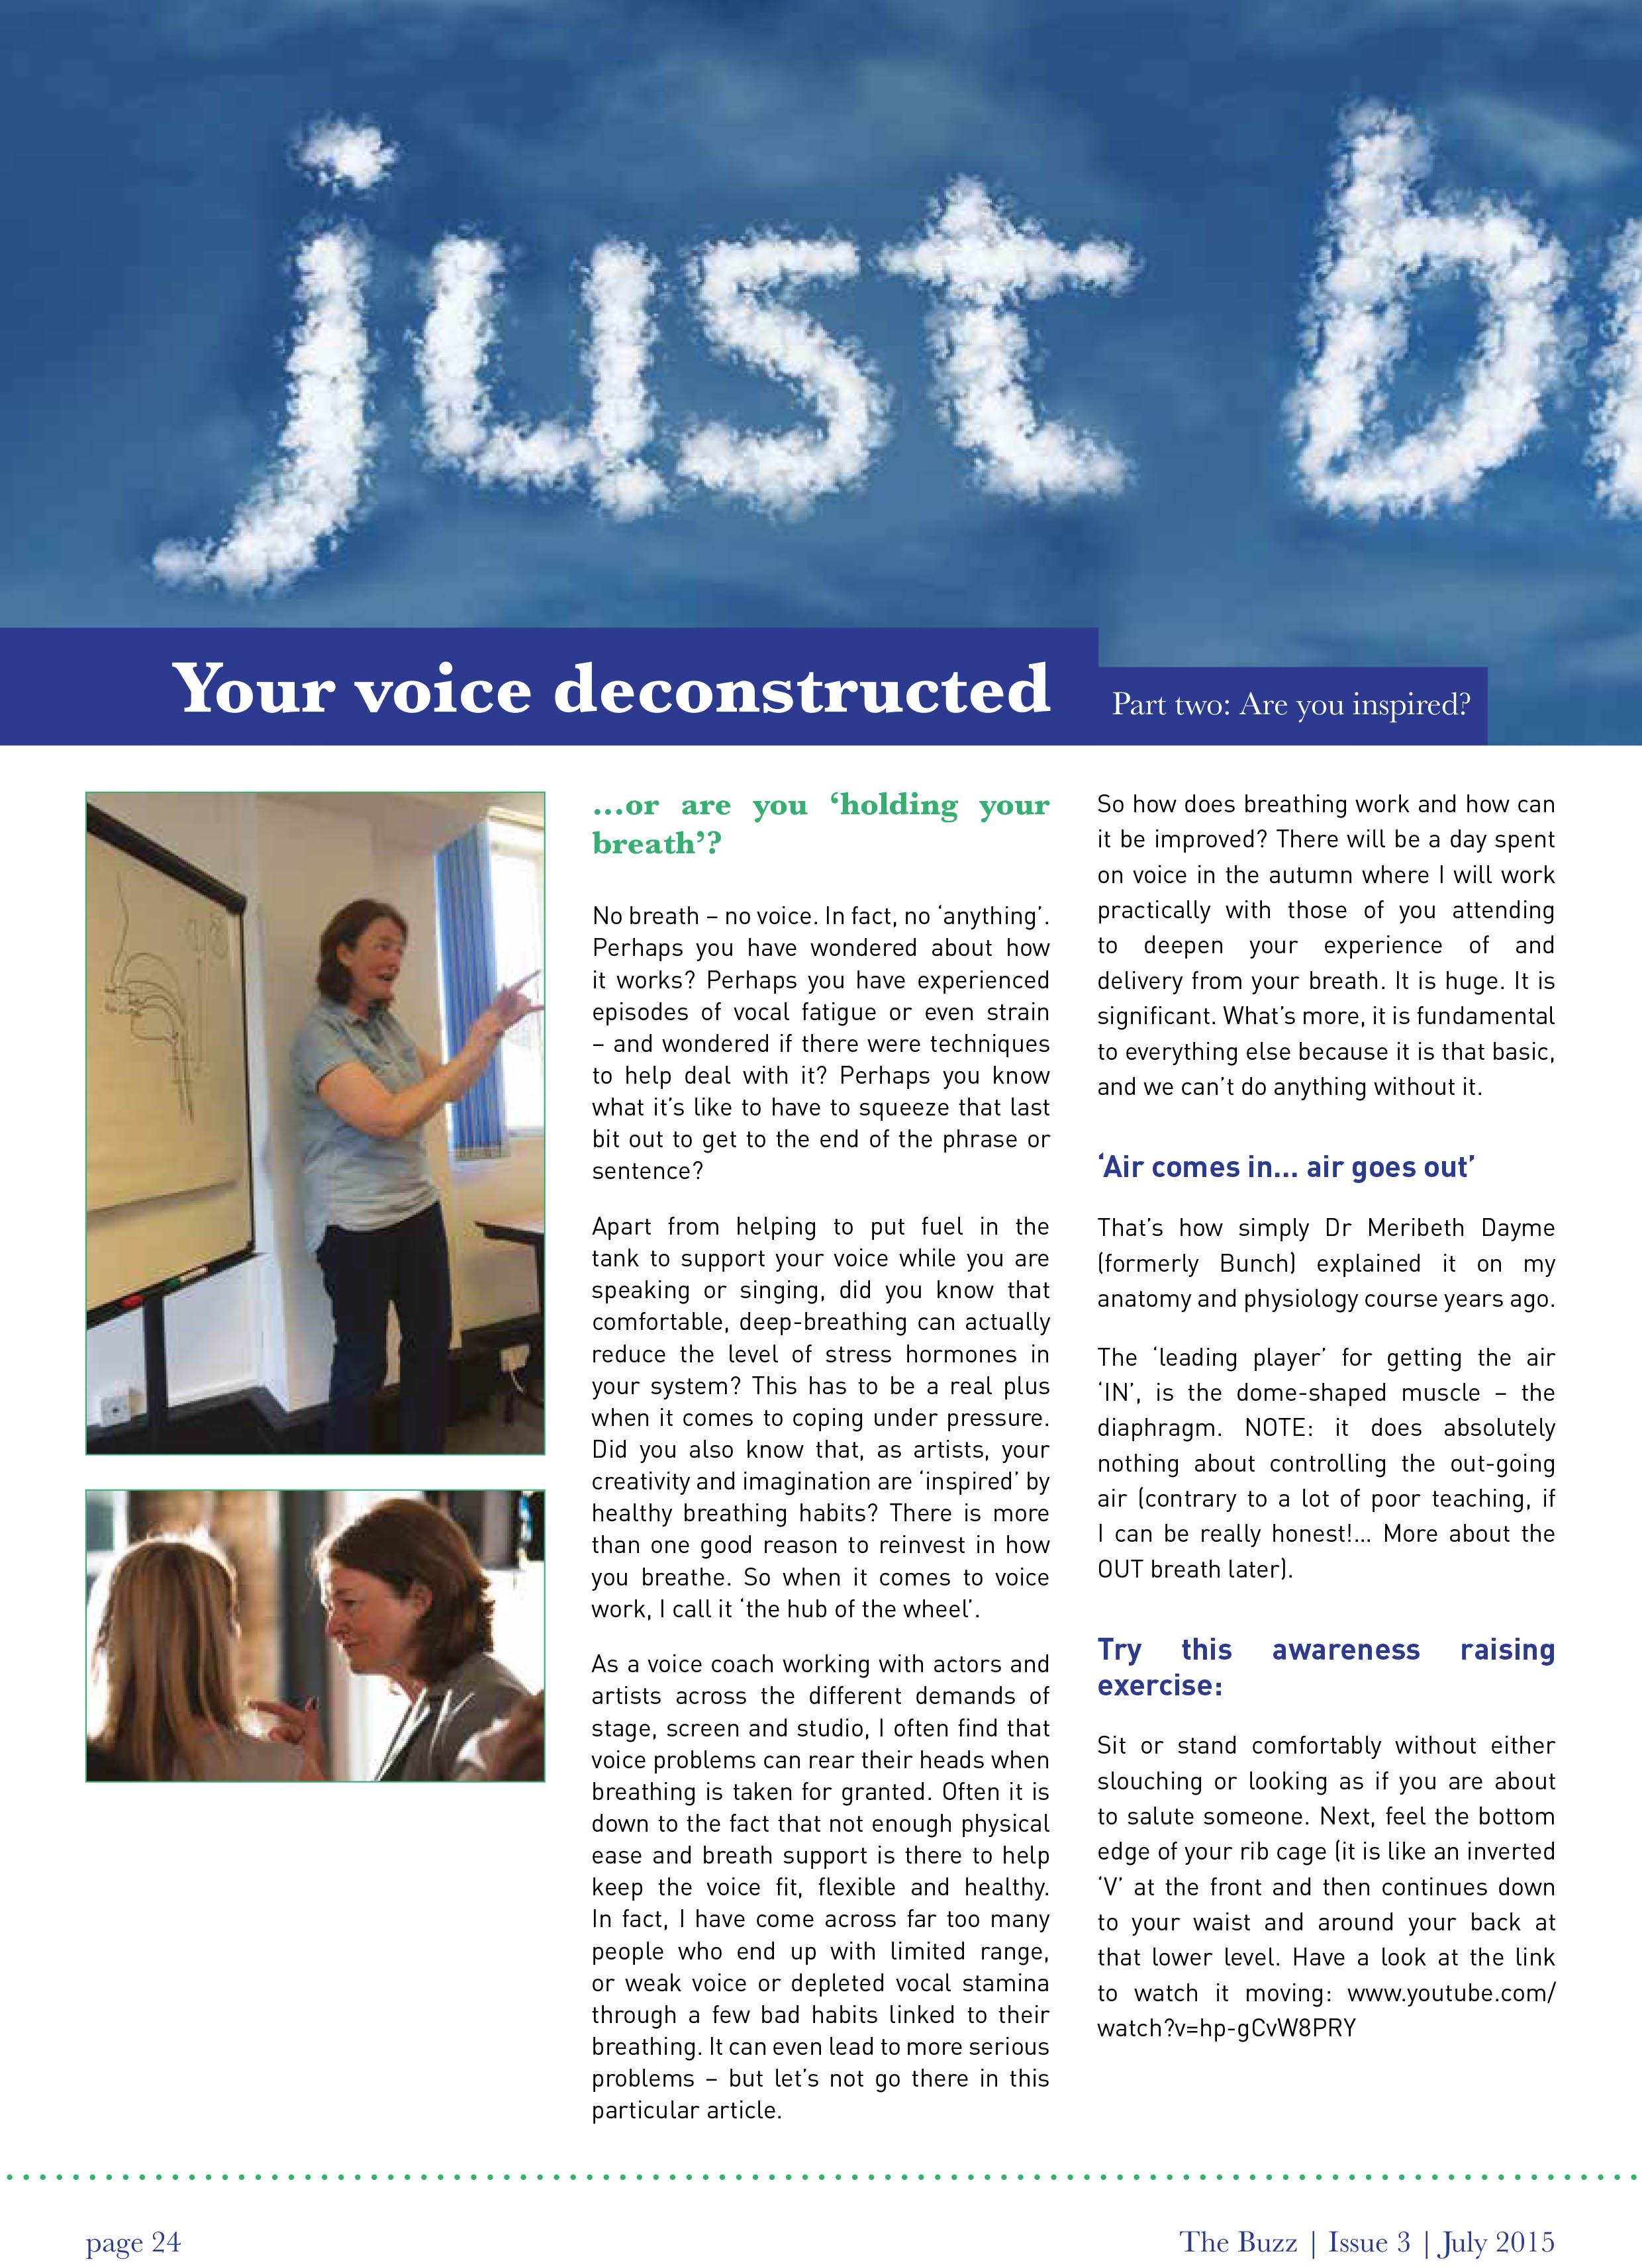 Your Voice Deconstructed – Part 2 Article